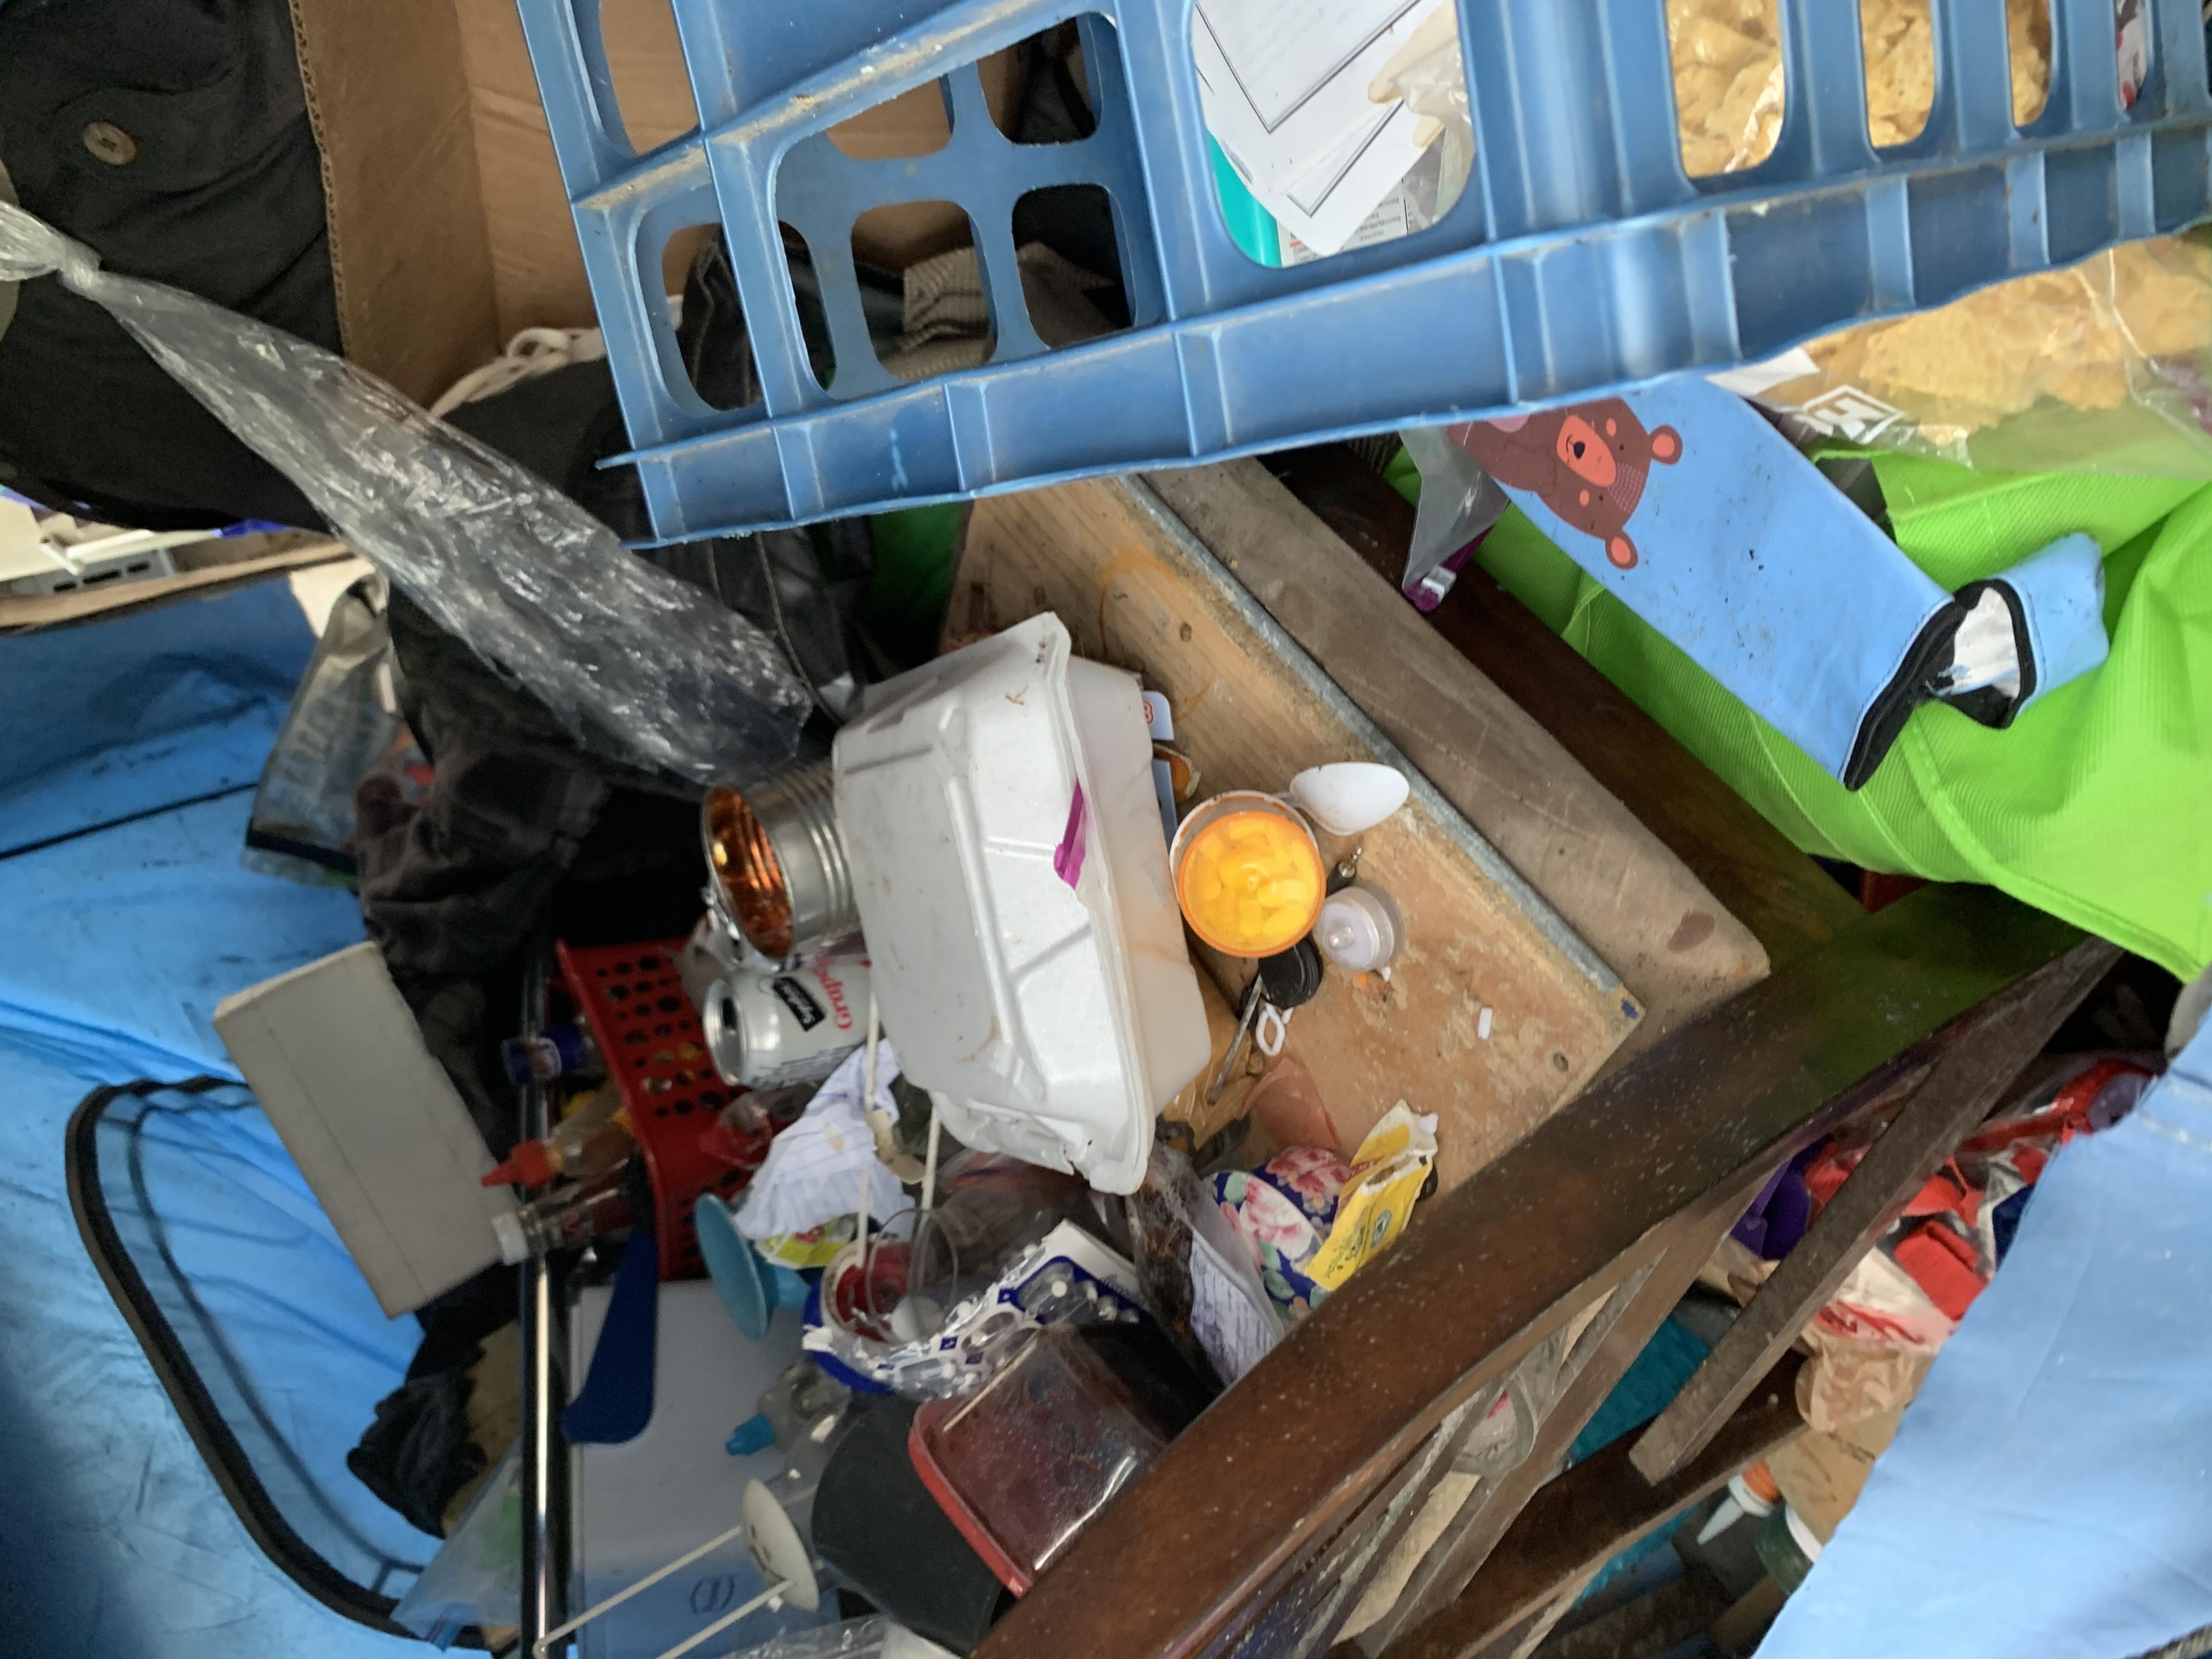 Tent full of items